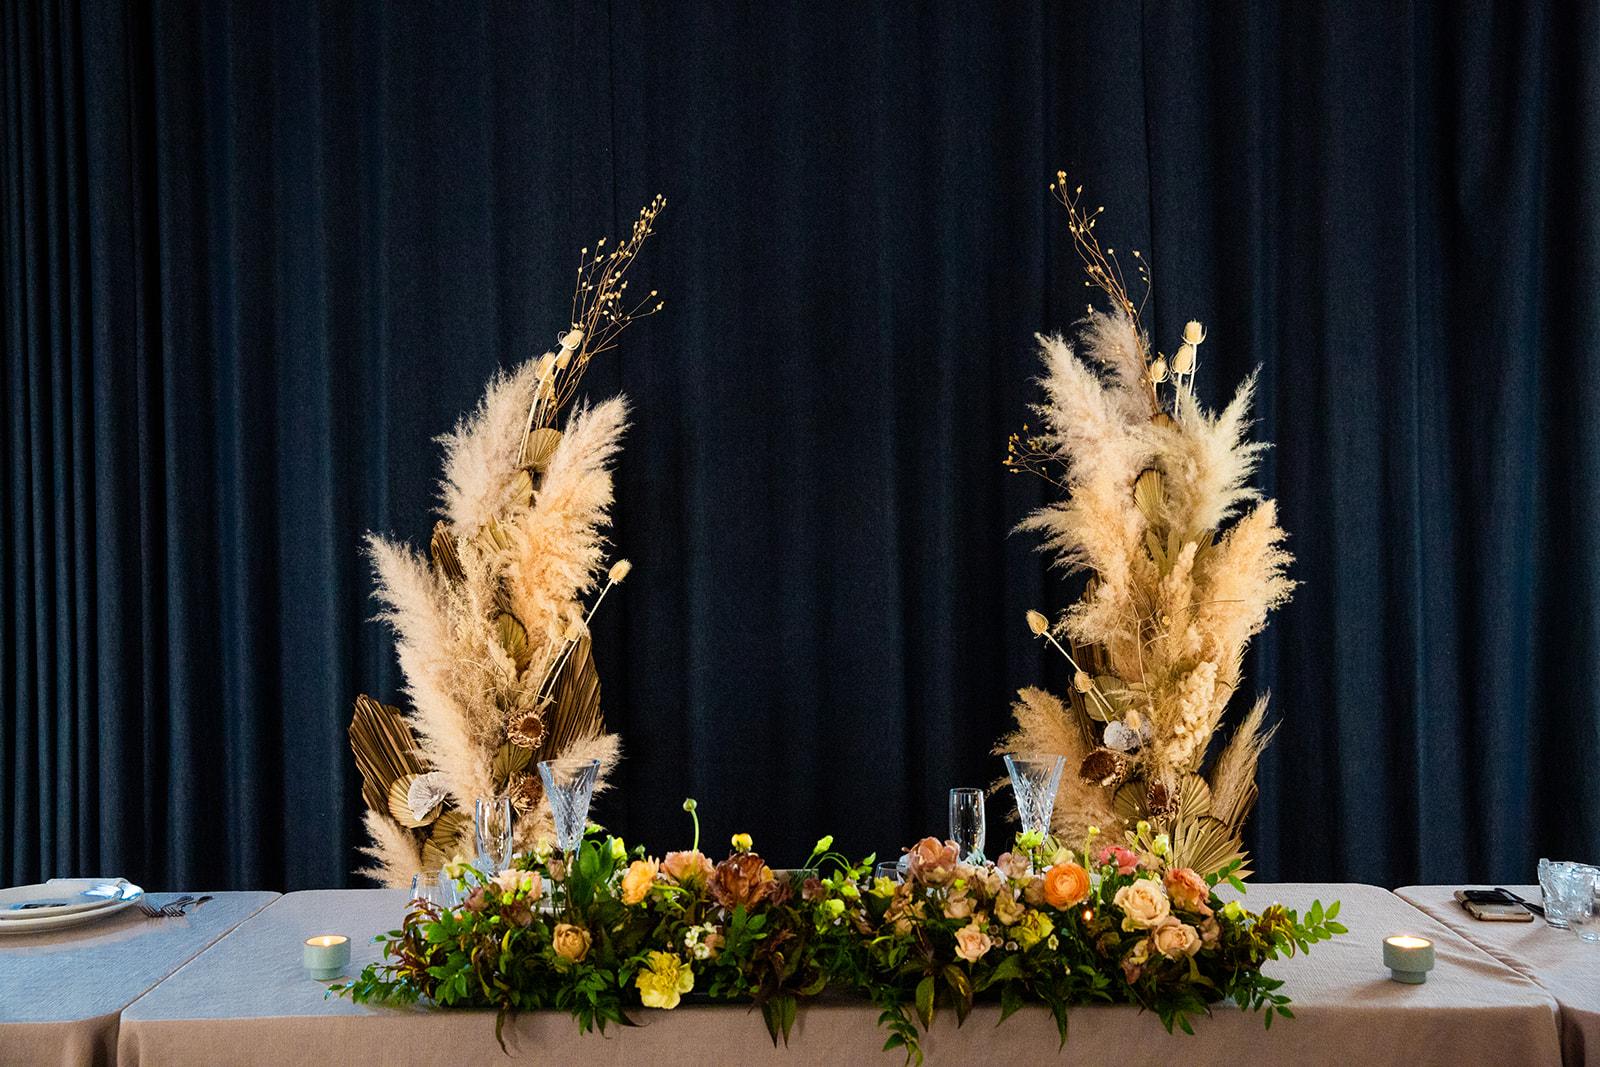 Dried_Desert_Florals_Sweetheart_Sibyl_Sophia_Des_Moines_Iowa.jpg